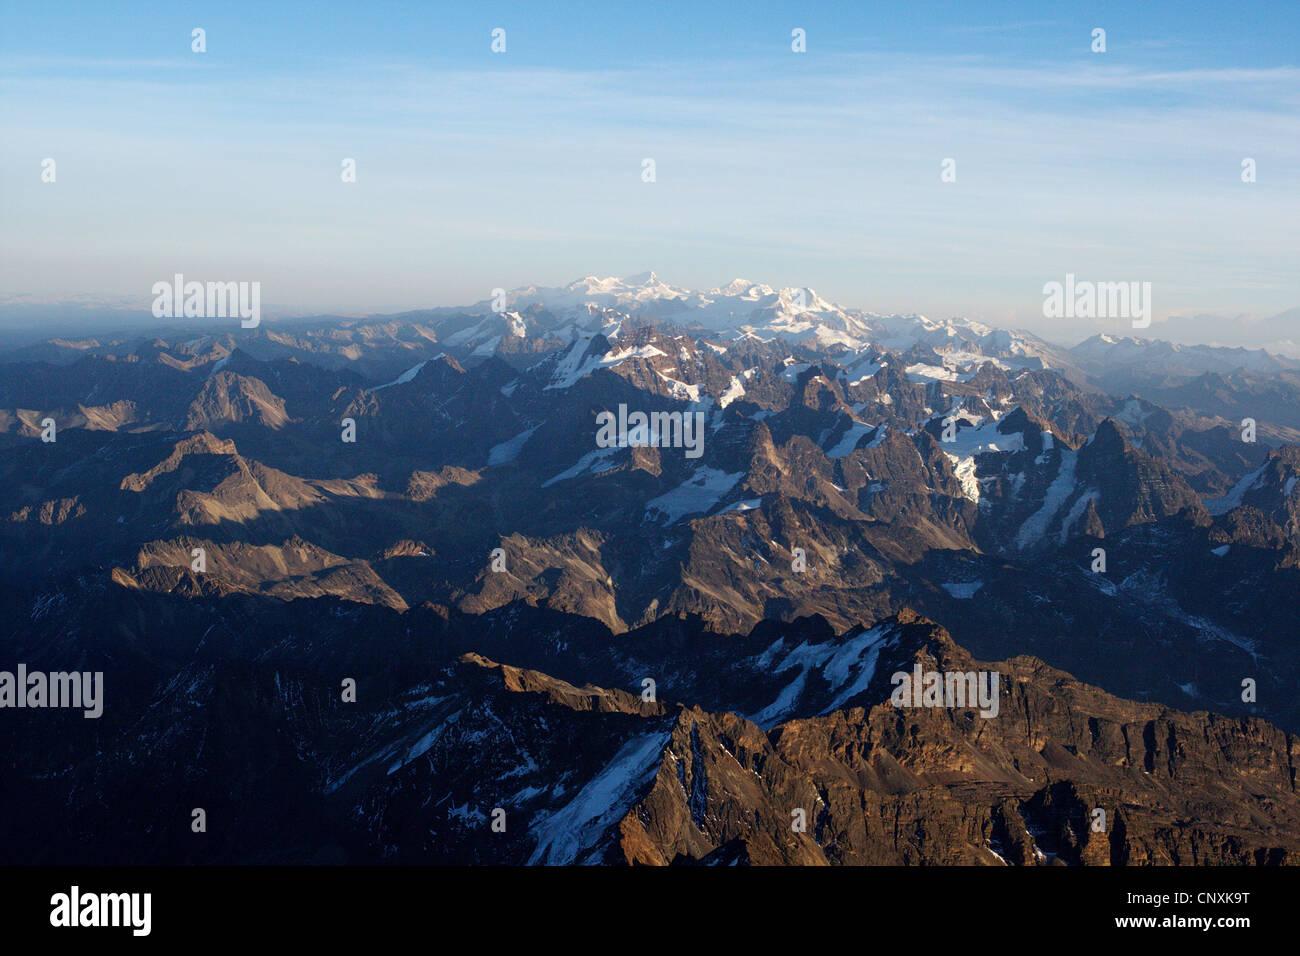 view from Huayna Potosi to Condoriri, Ancohuma and Illampu, Bolivia, Andes, Cordillera Real - Stock Image